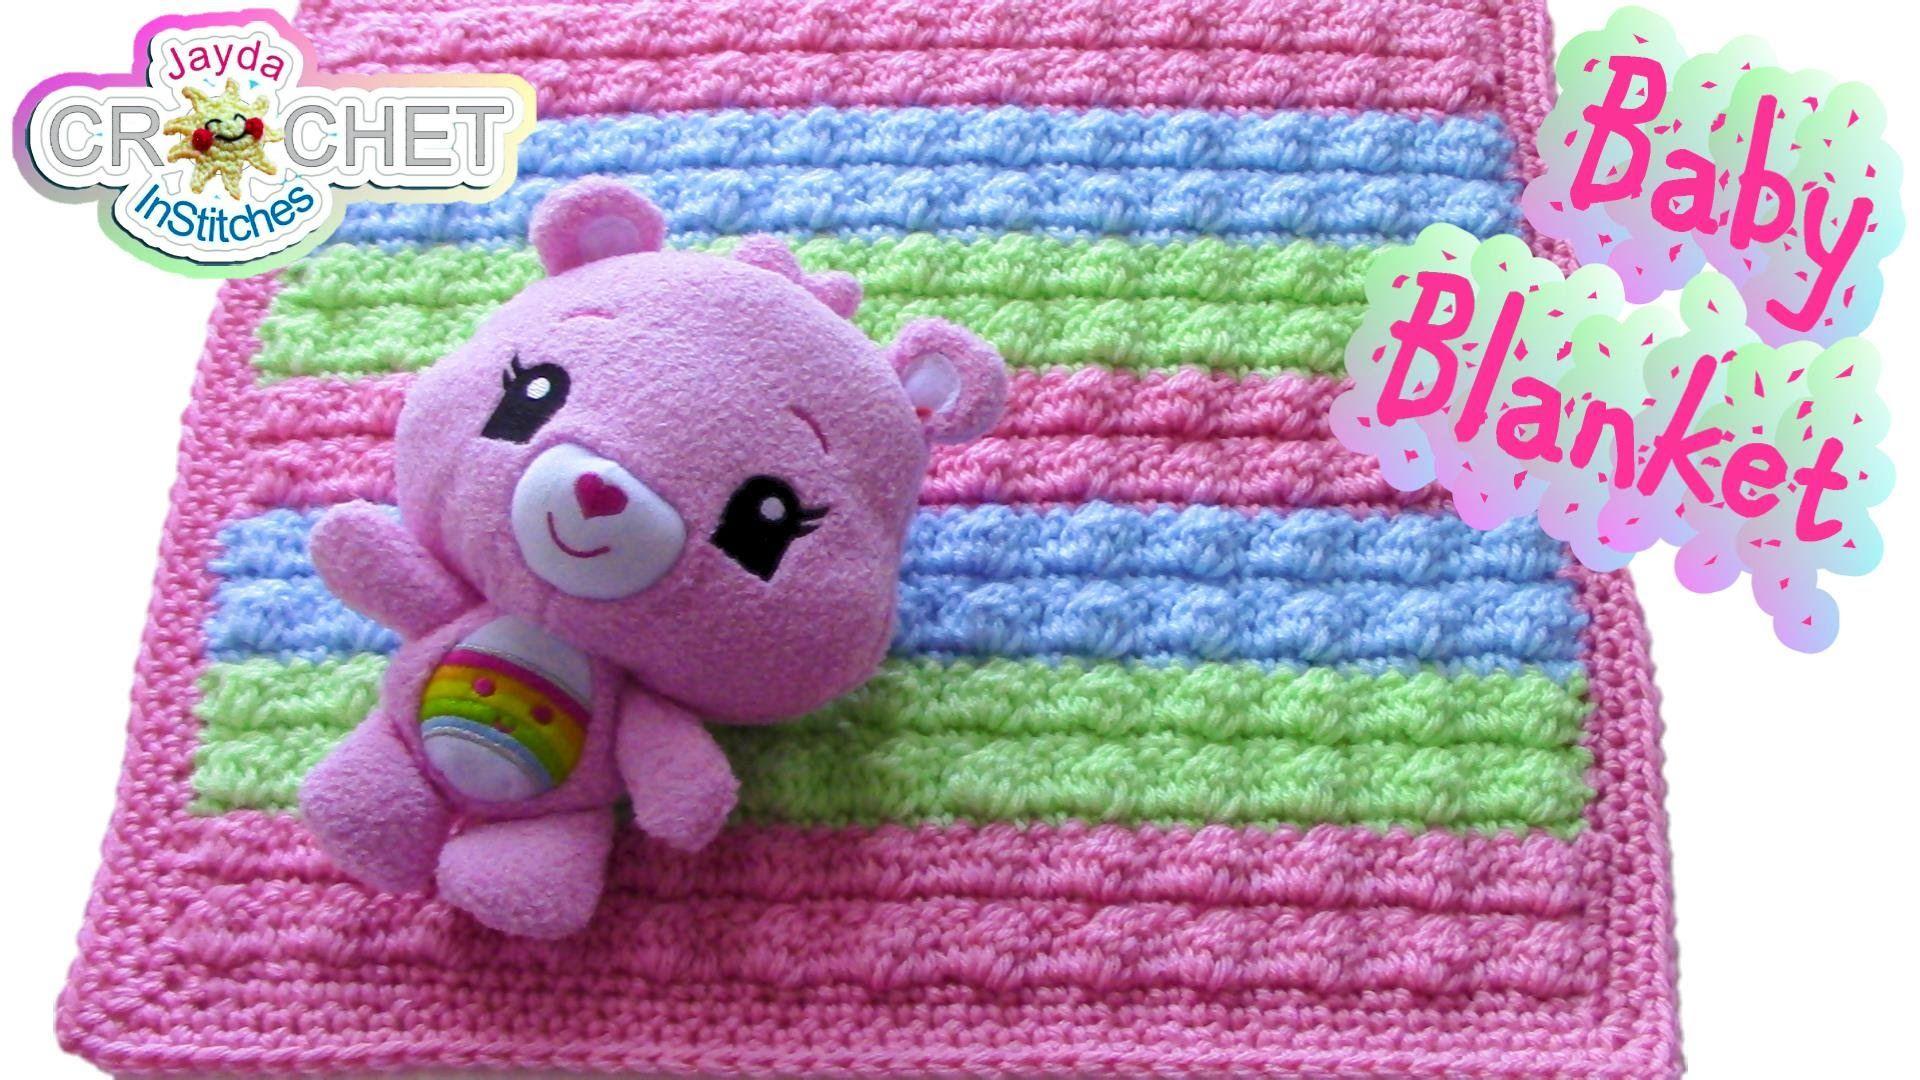 Crochet Bobble Stitch Baby Blanket Pattern | Crafts | Pinterest ...